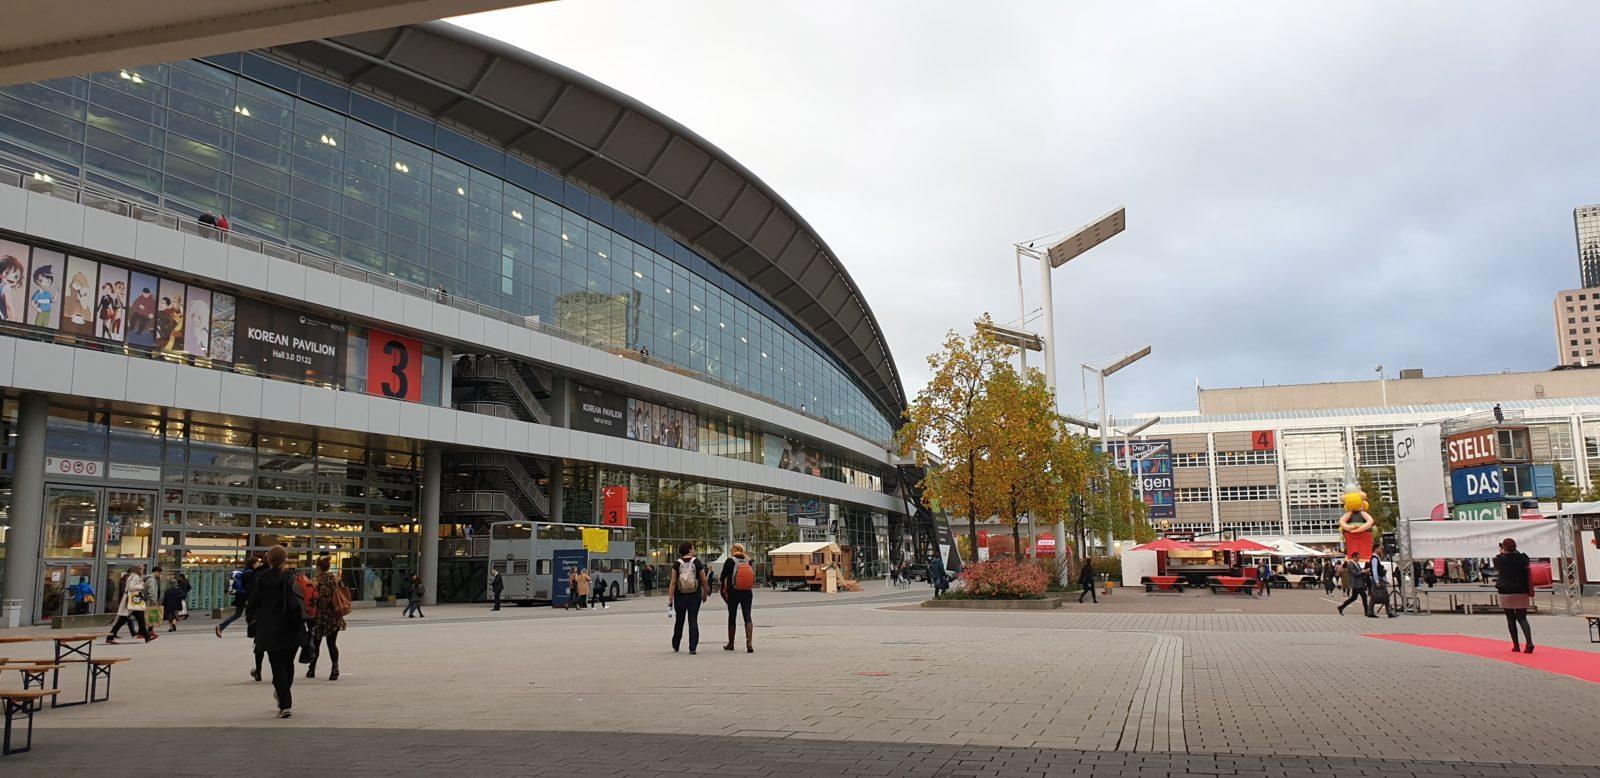 frankfurter buchmesse 2019 #fbm19